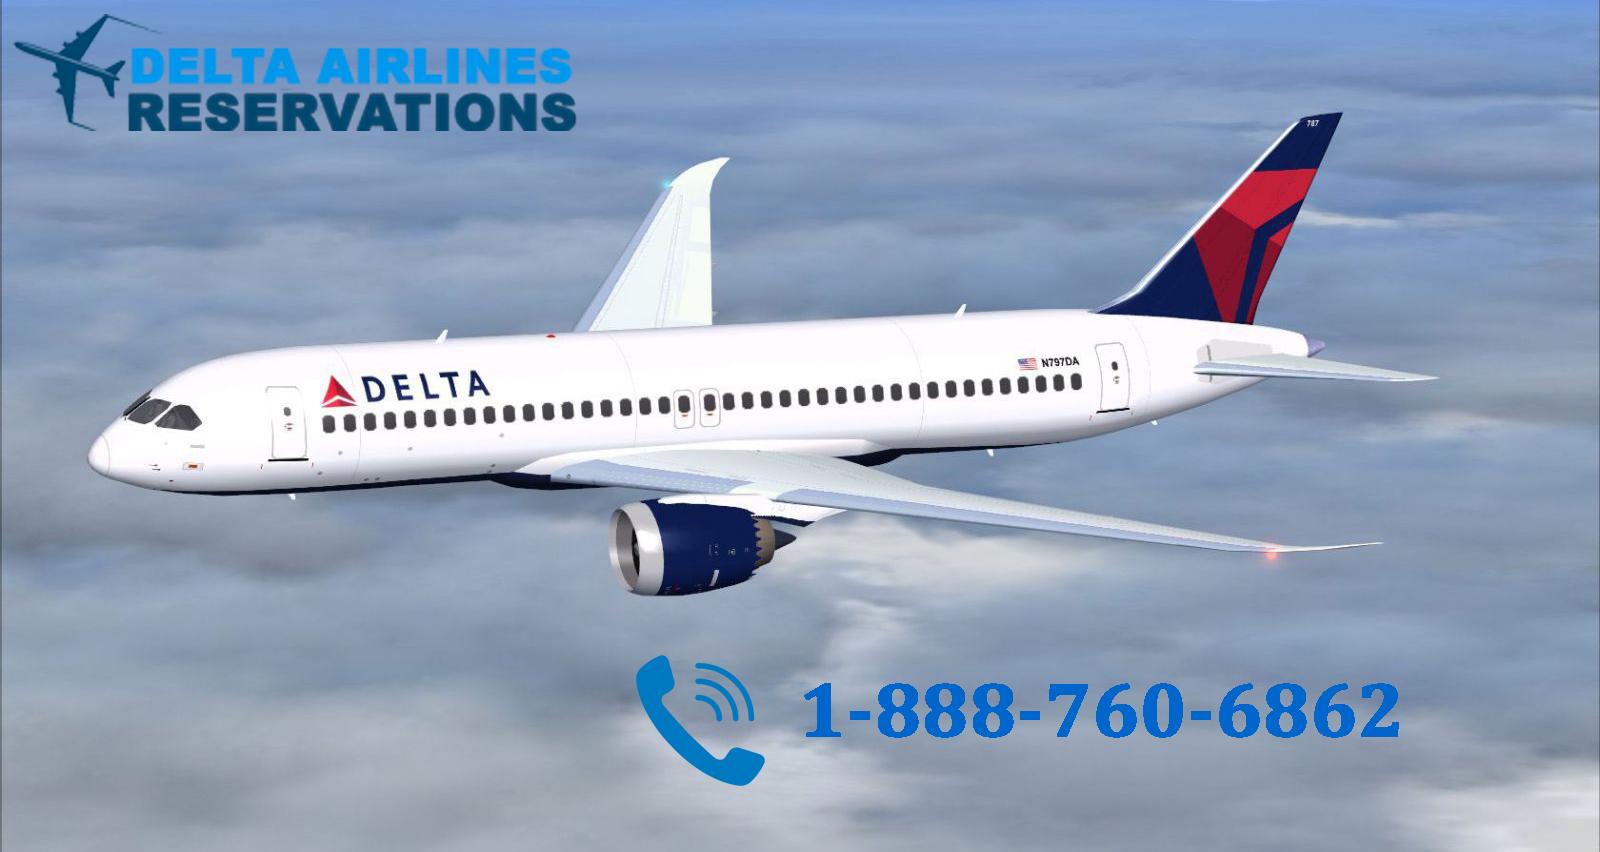 65 Best Delta Airlines Reservations images | Delta airlines ...